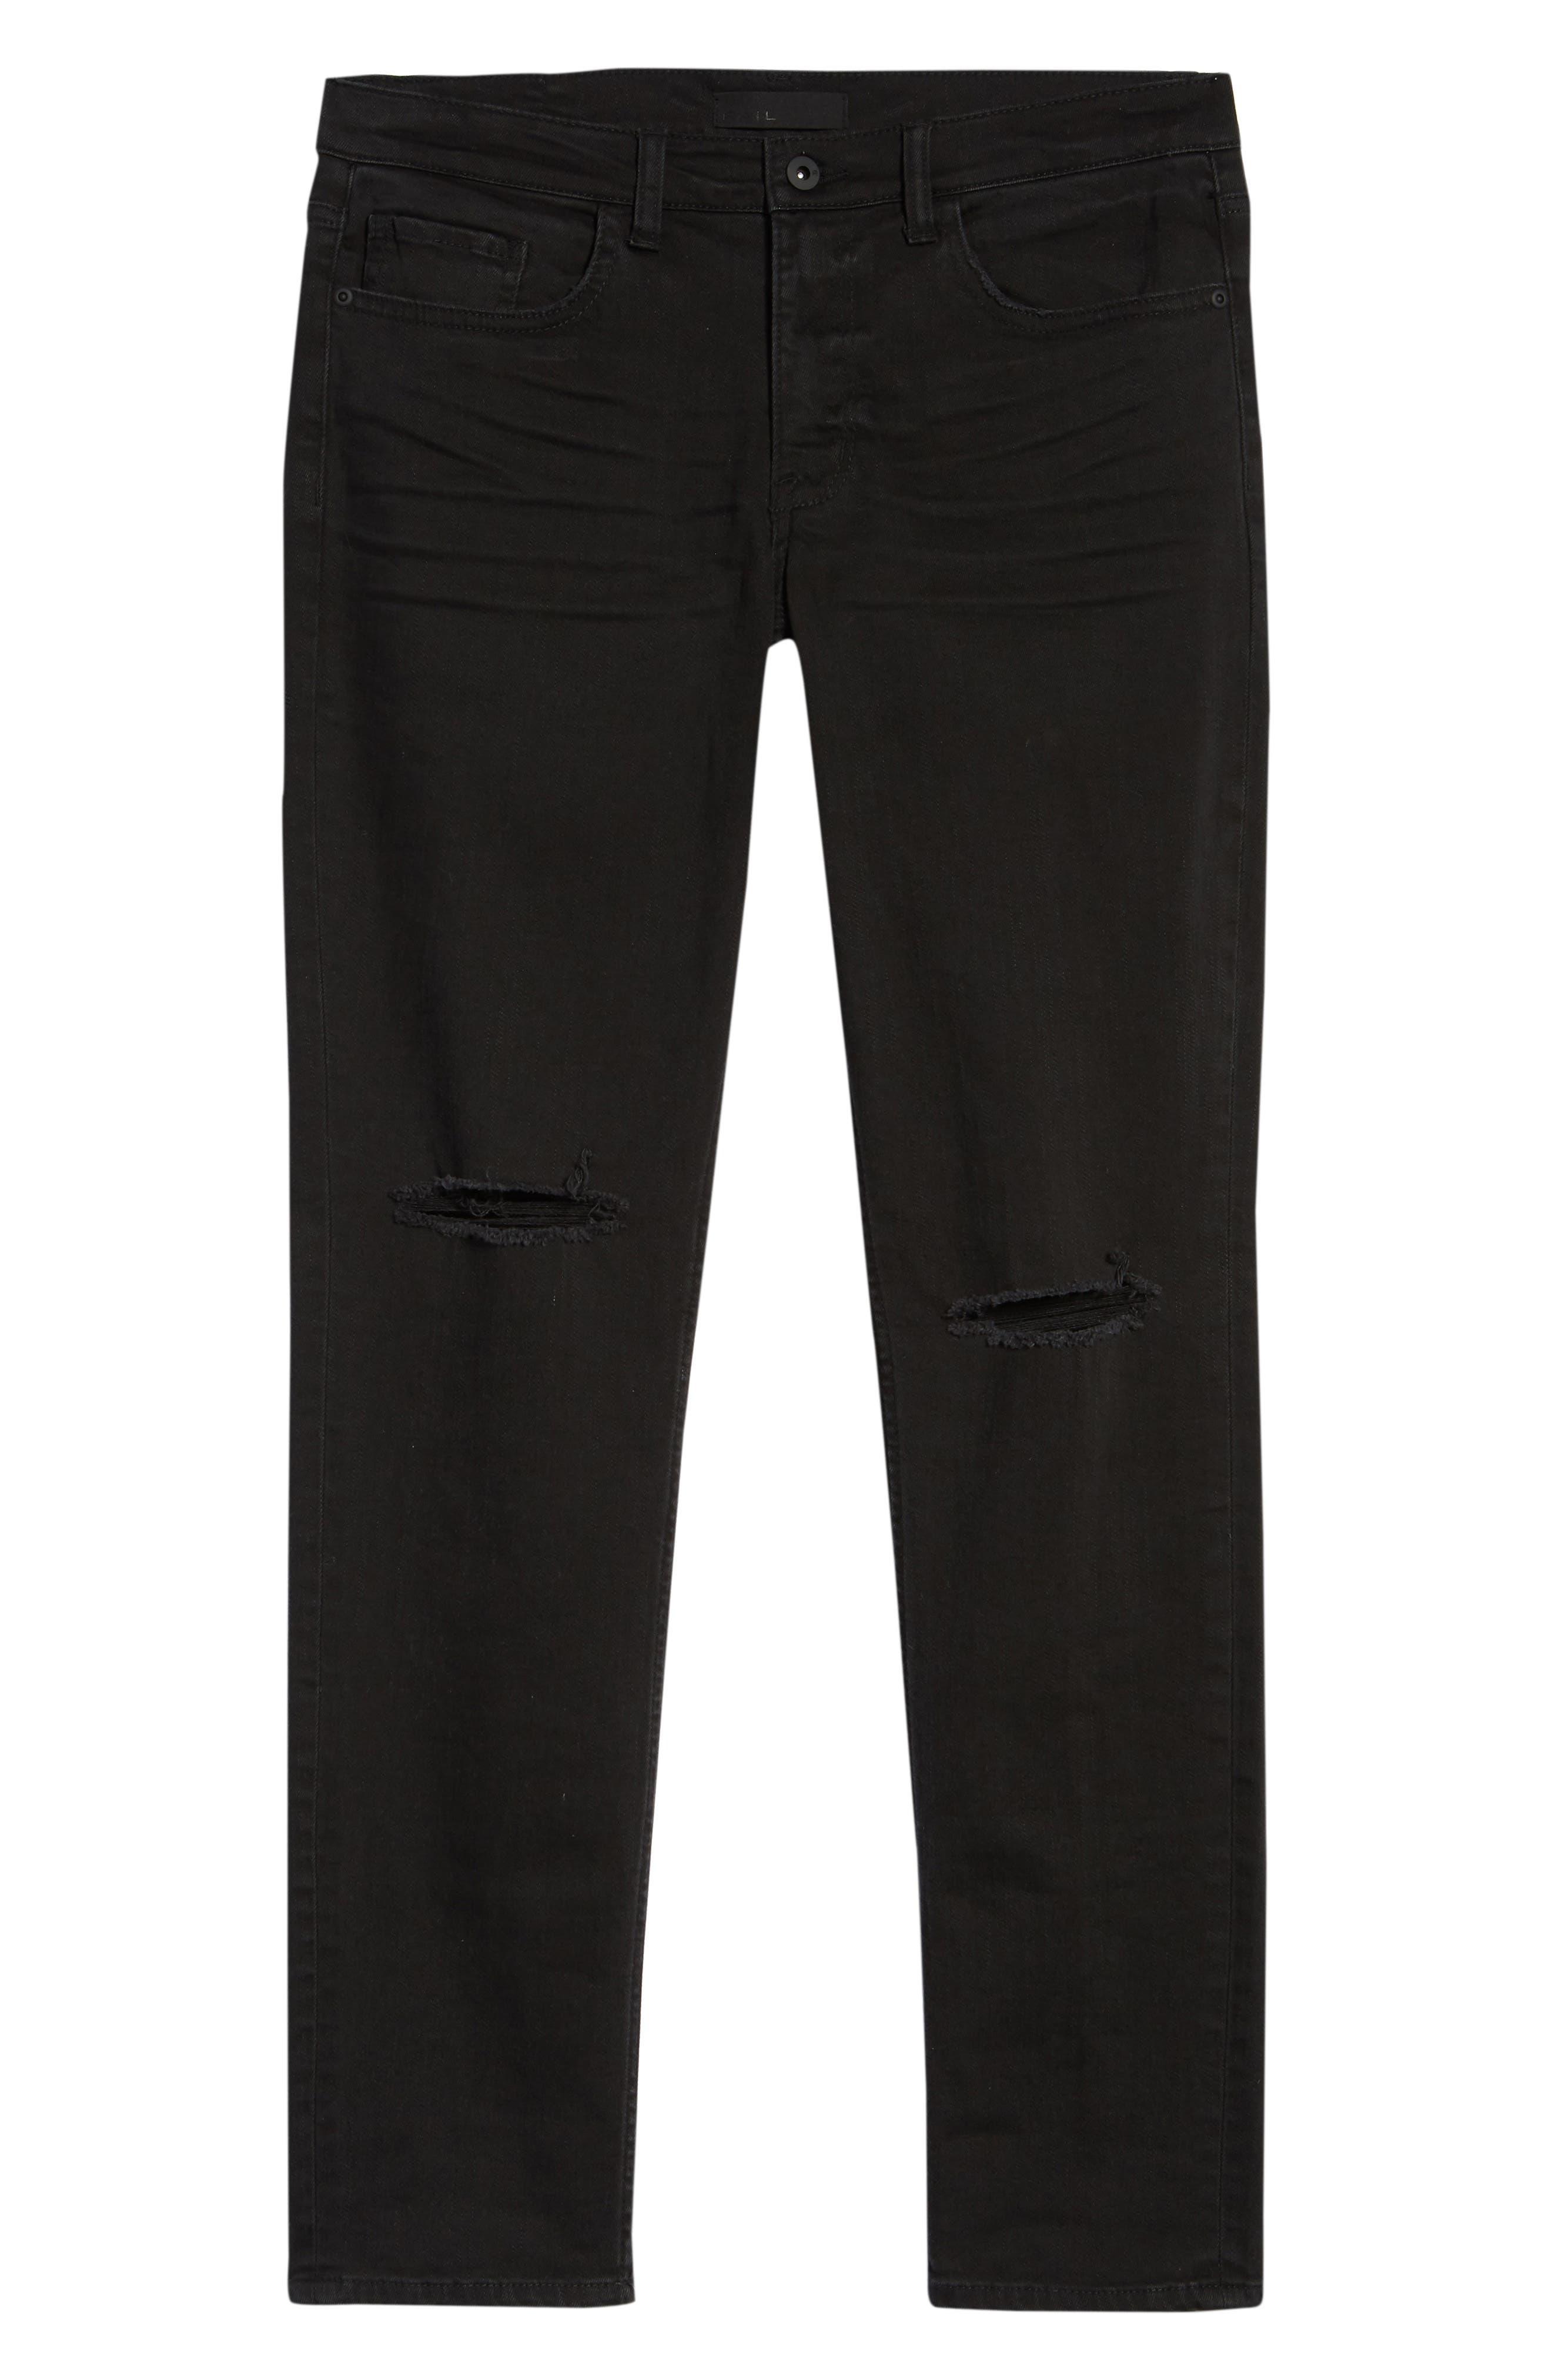 THE RAIL, Ripped Skinny Jeans, Alternate thumbnail 7, color, BLACK STONE WASH